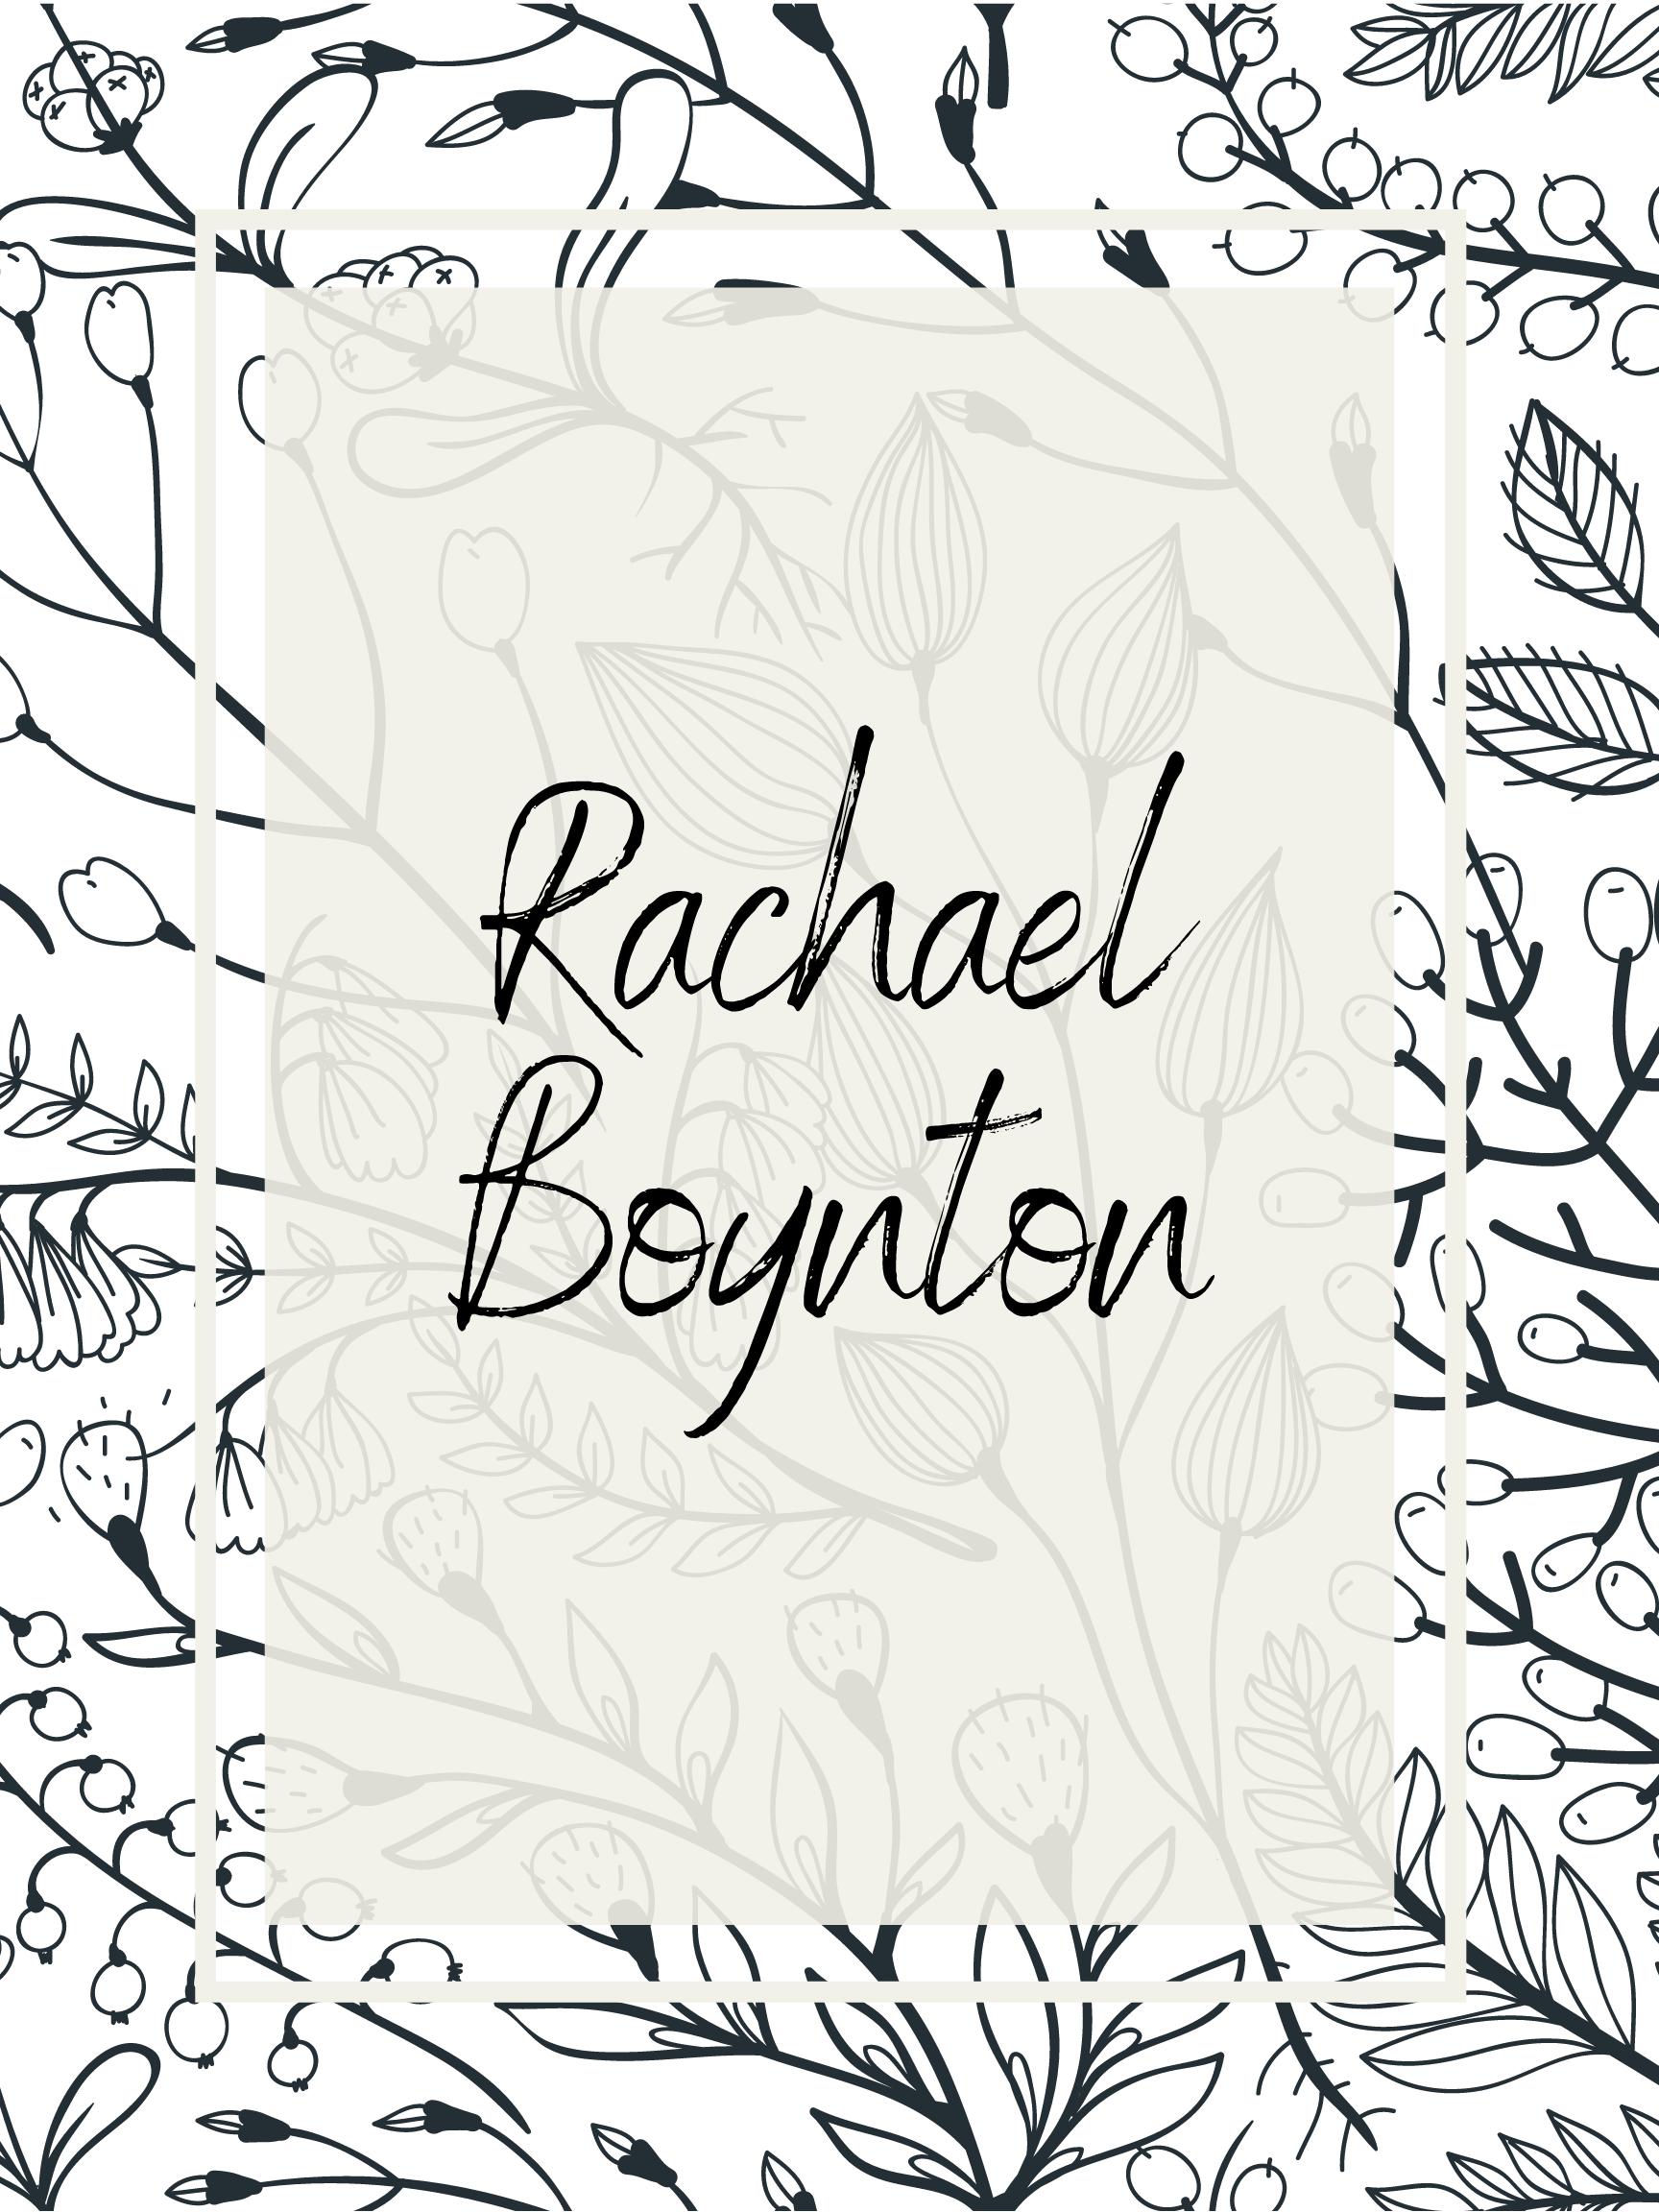 Rachael Boynton